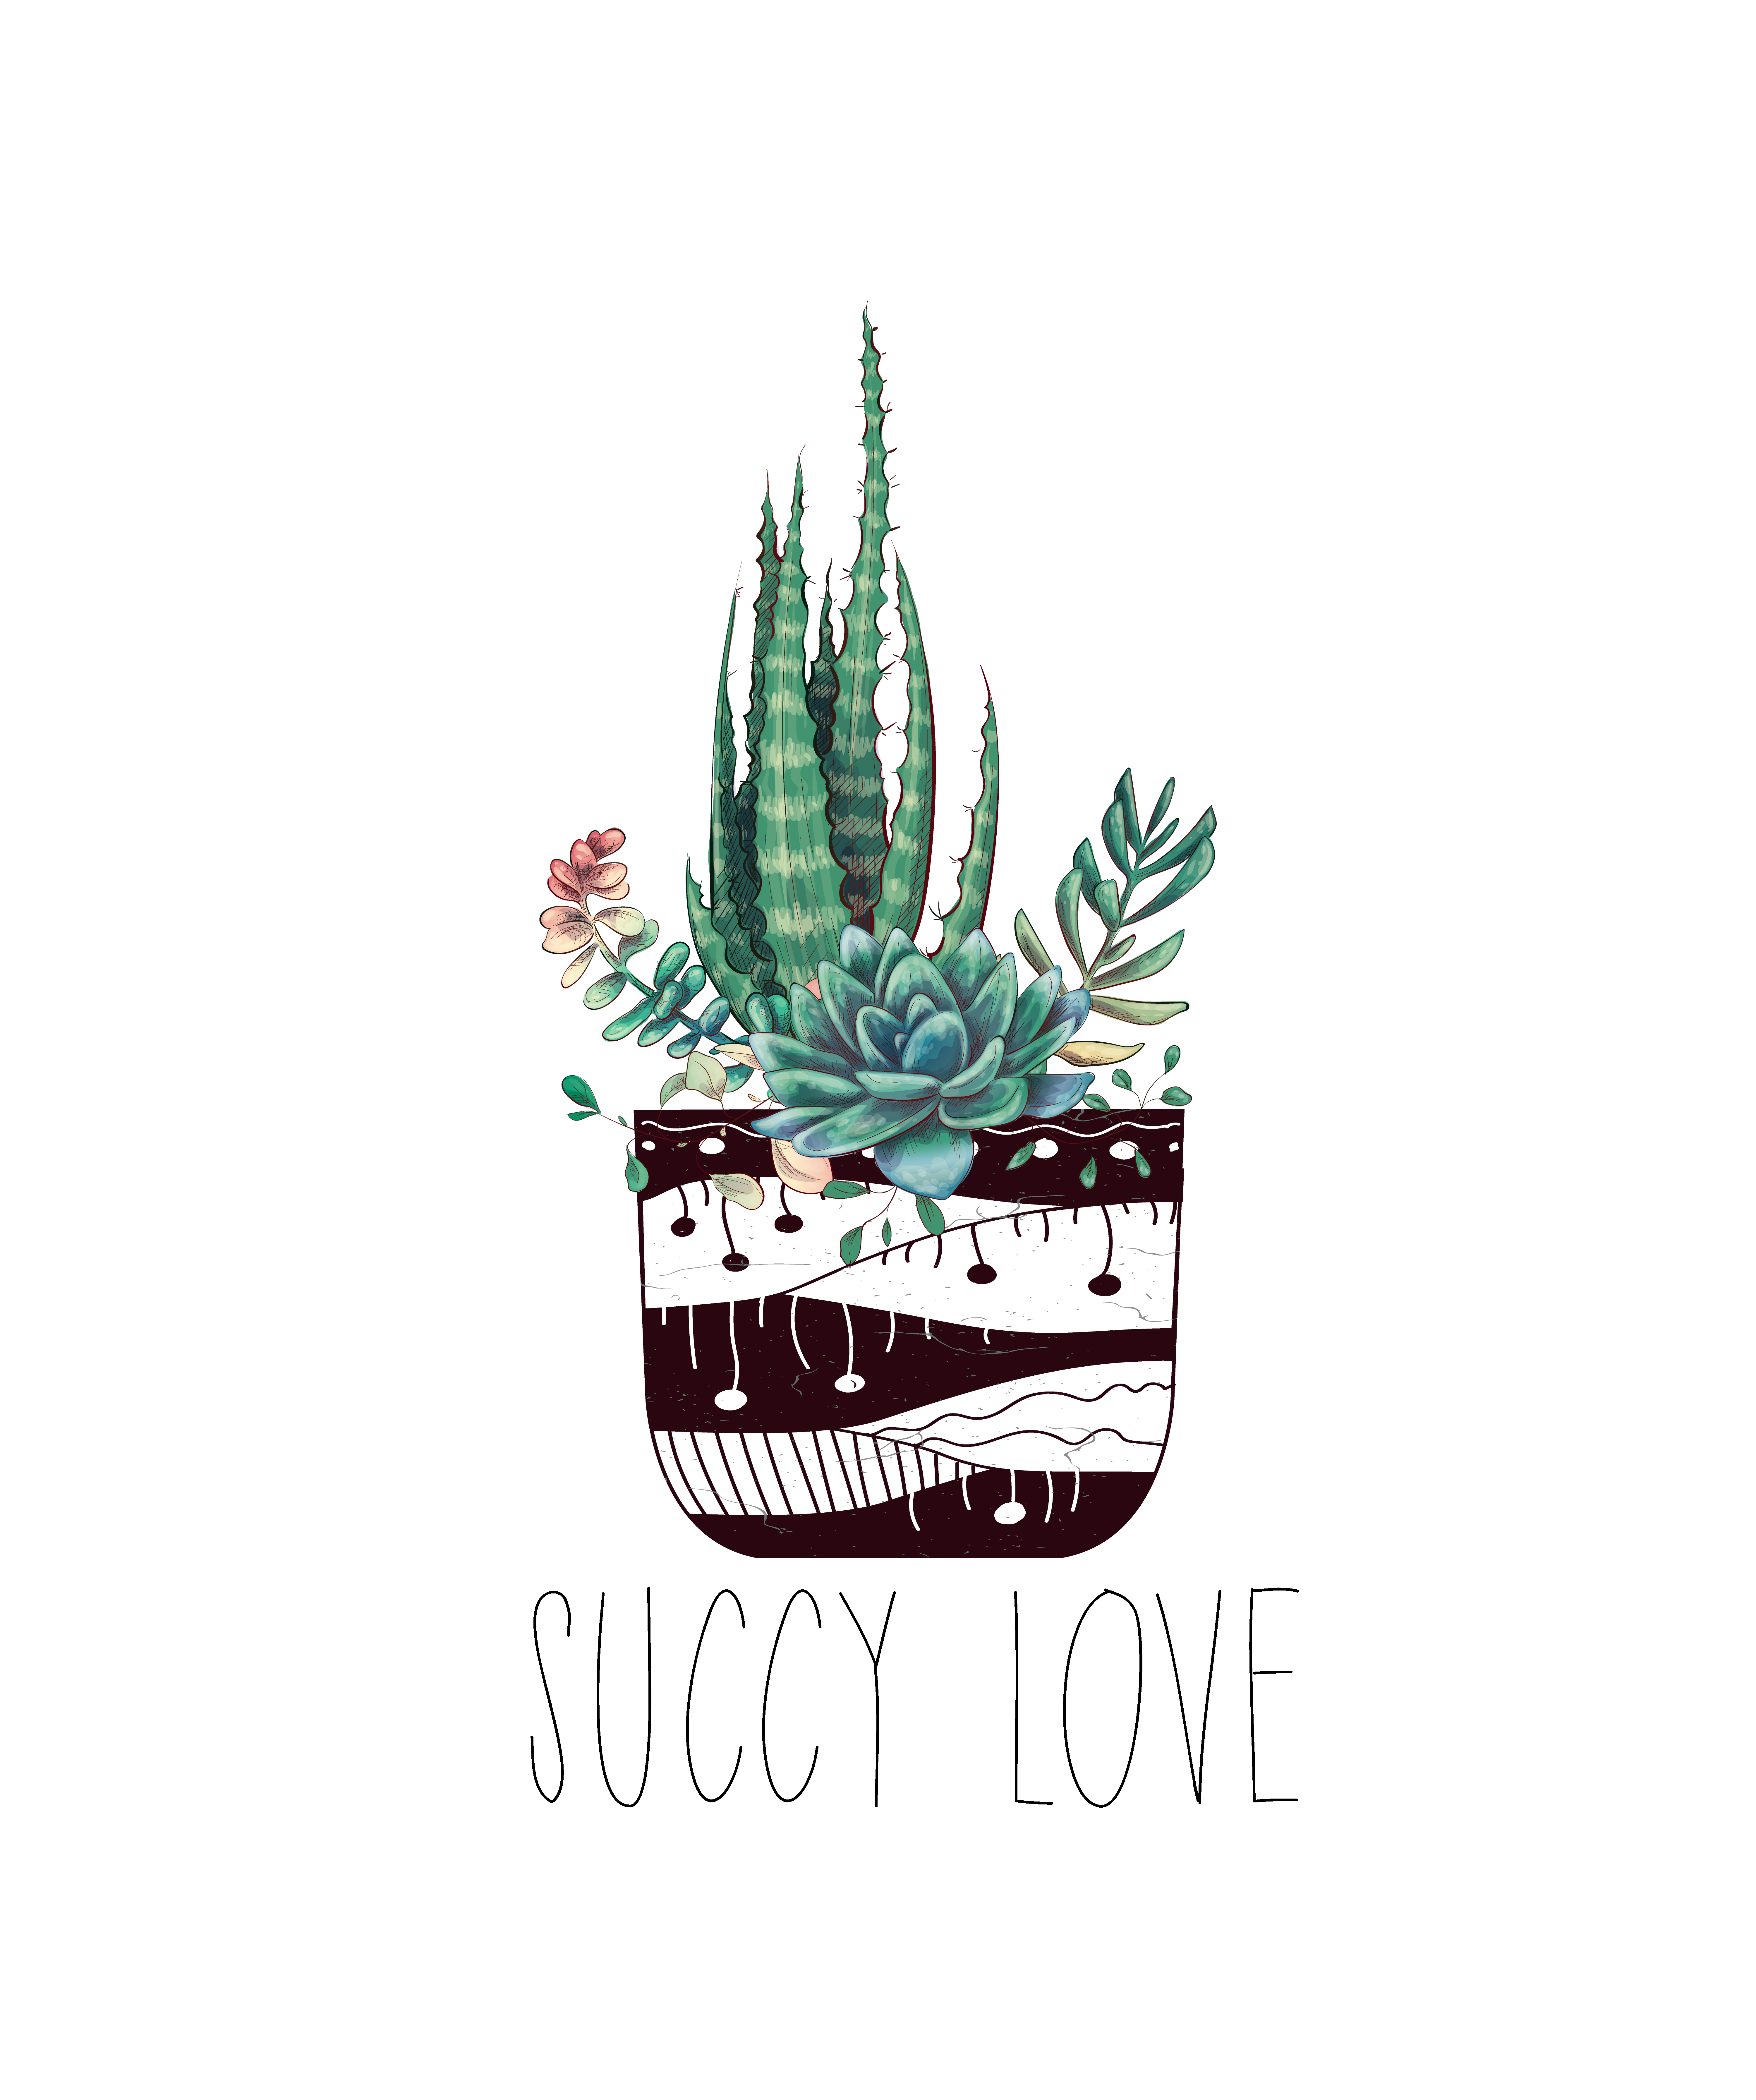 Succy Love